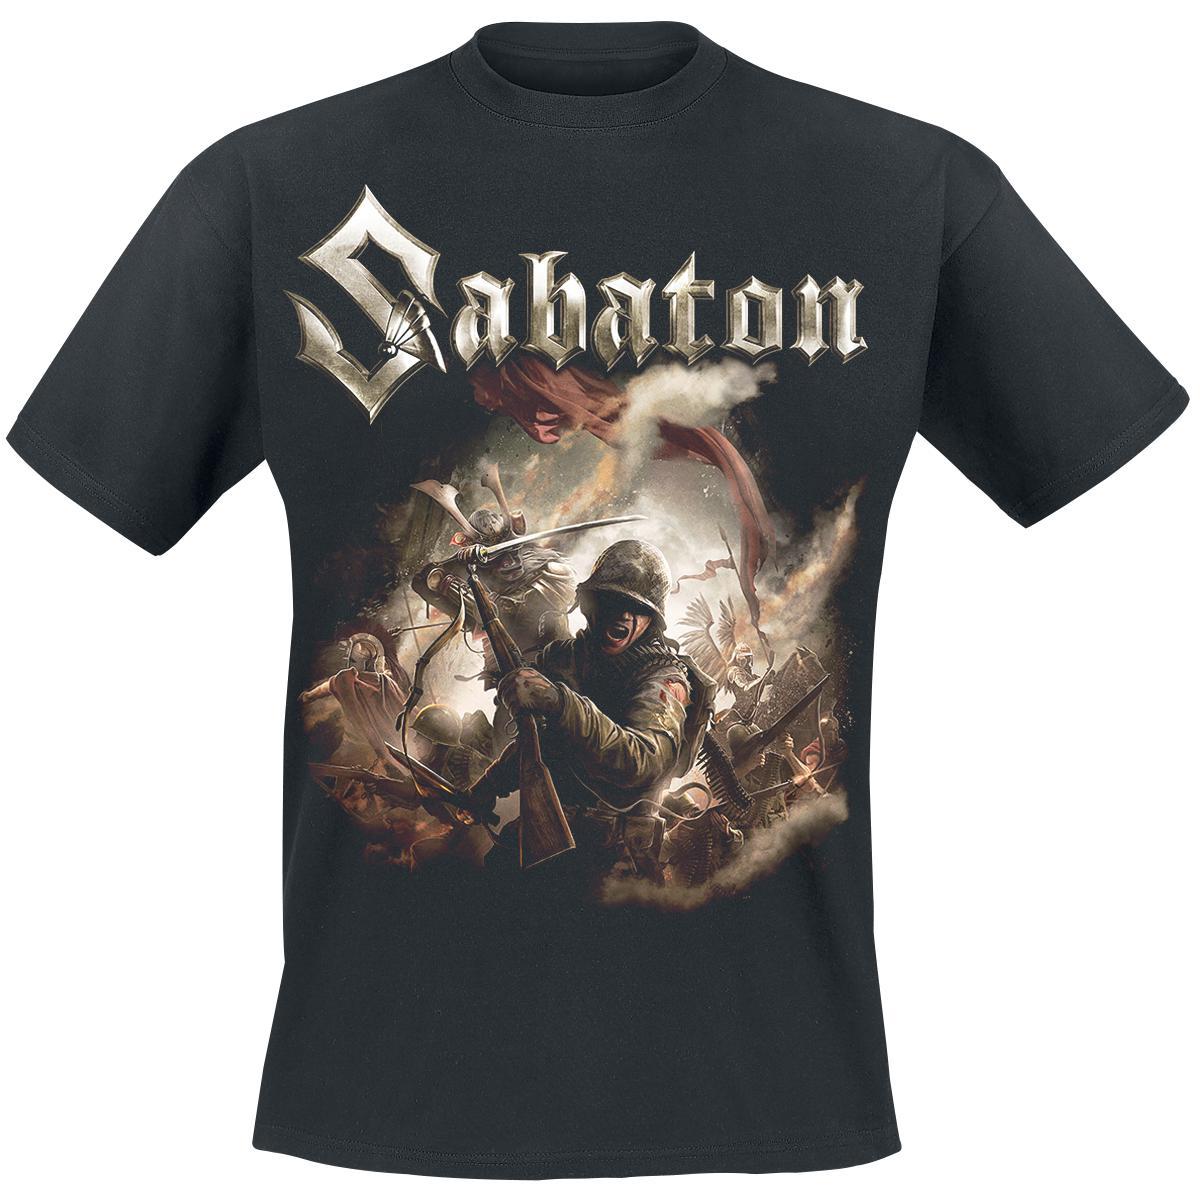 Sabaton - Tshirt